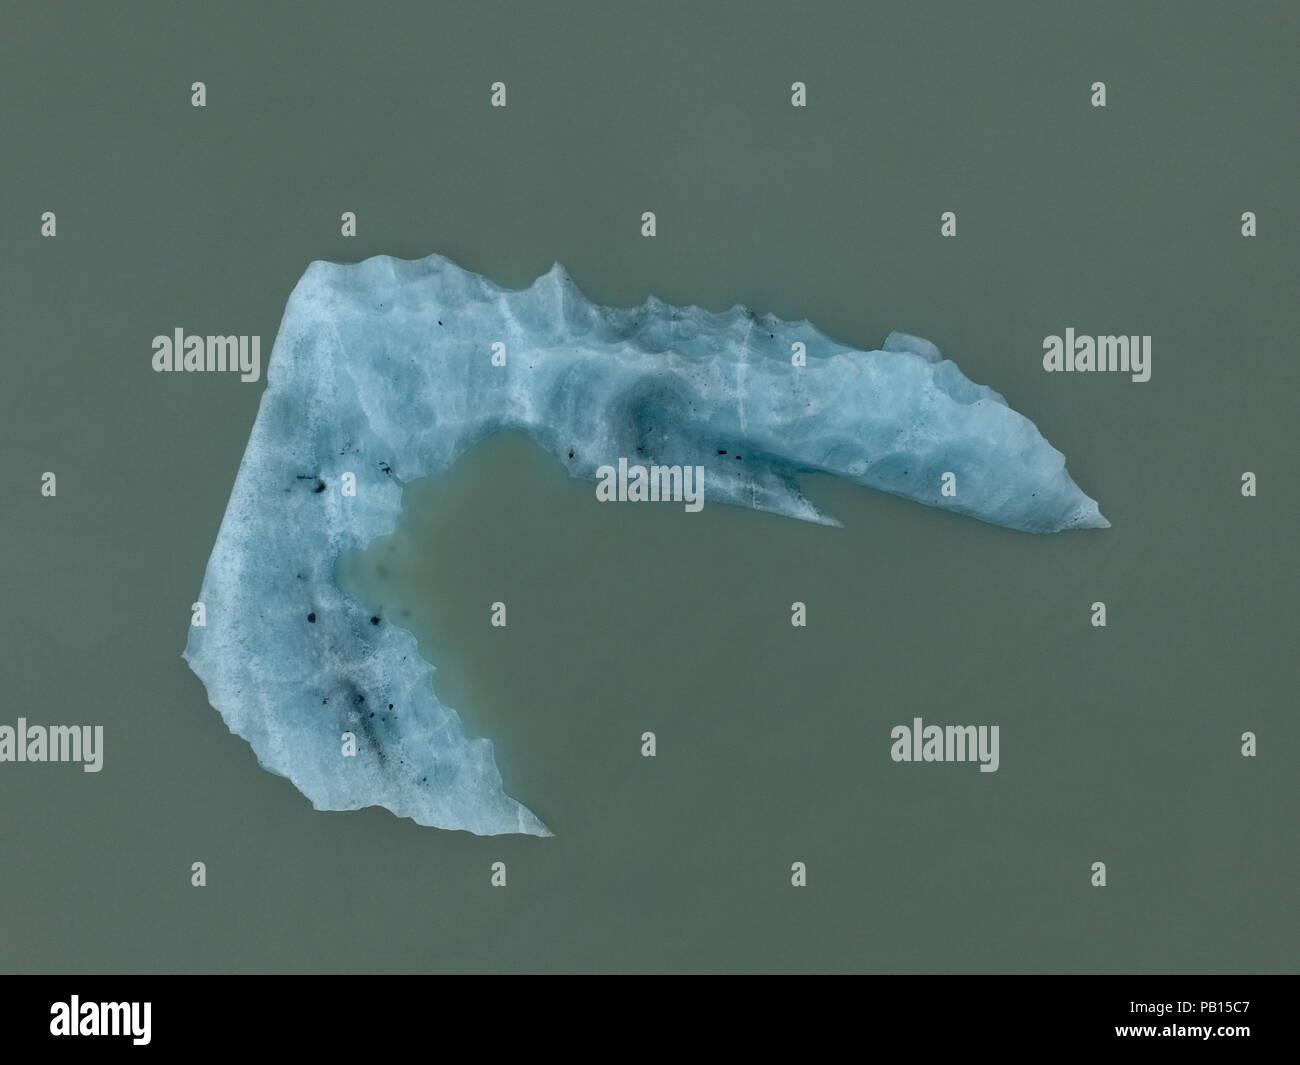 Fragmento de hielo. Glaciar Grosse. Carretera Austral, Patagonia, Chile - Stock Image